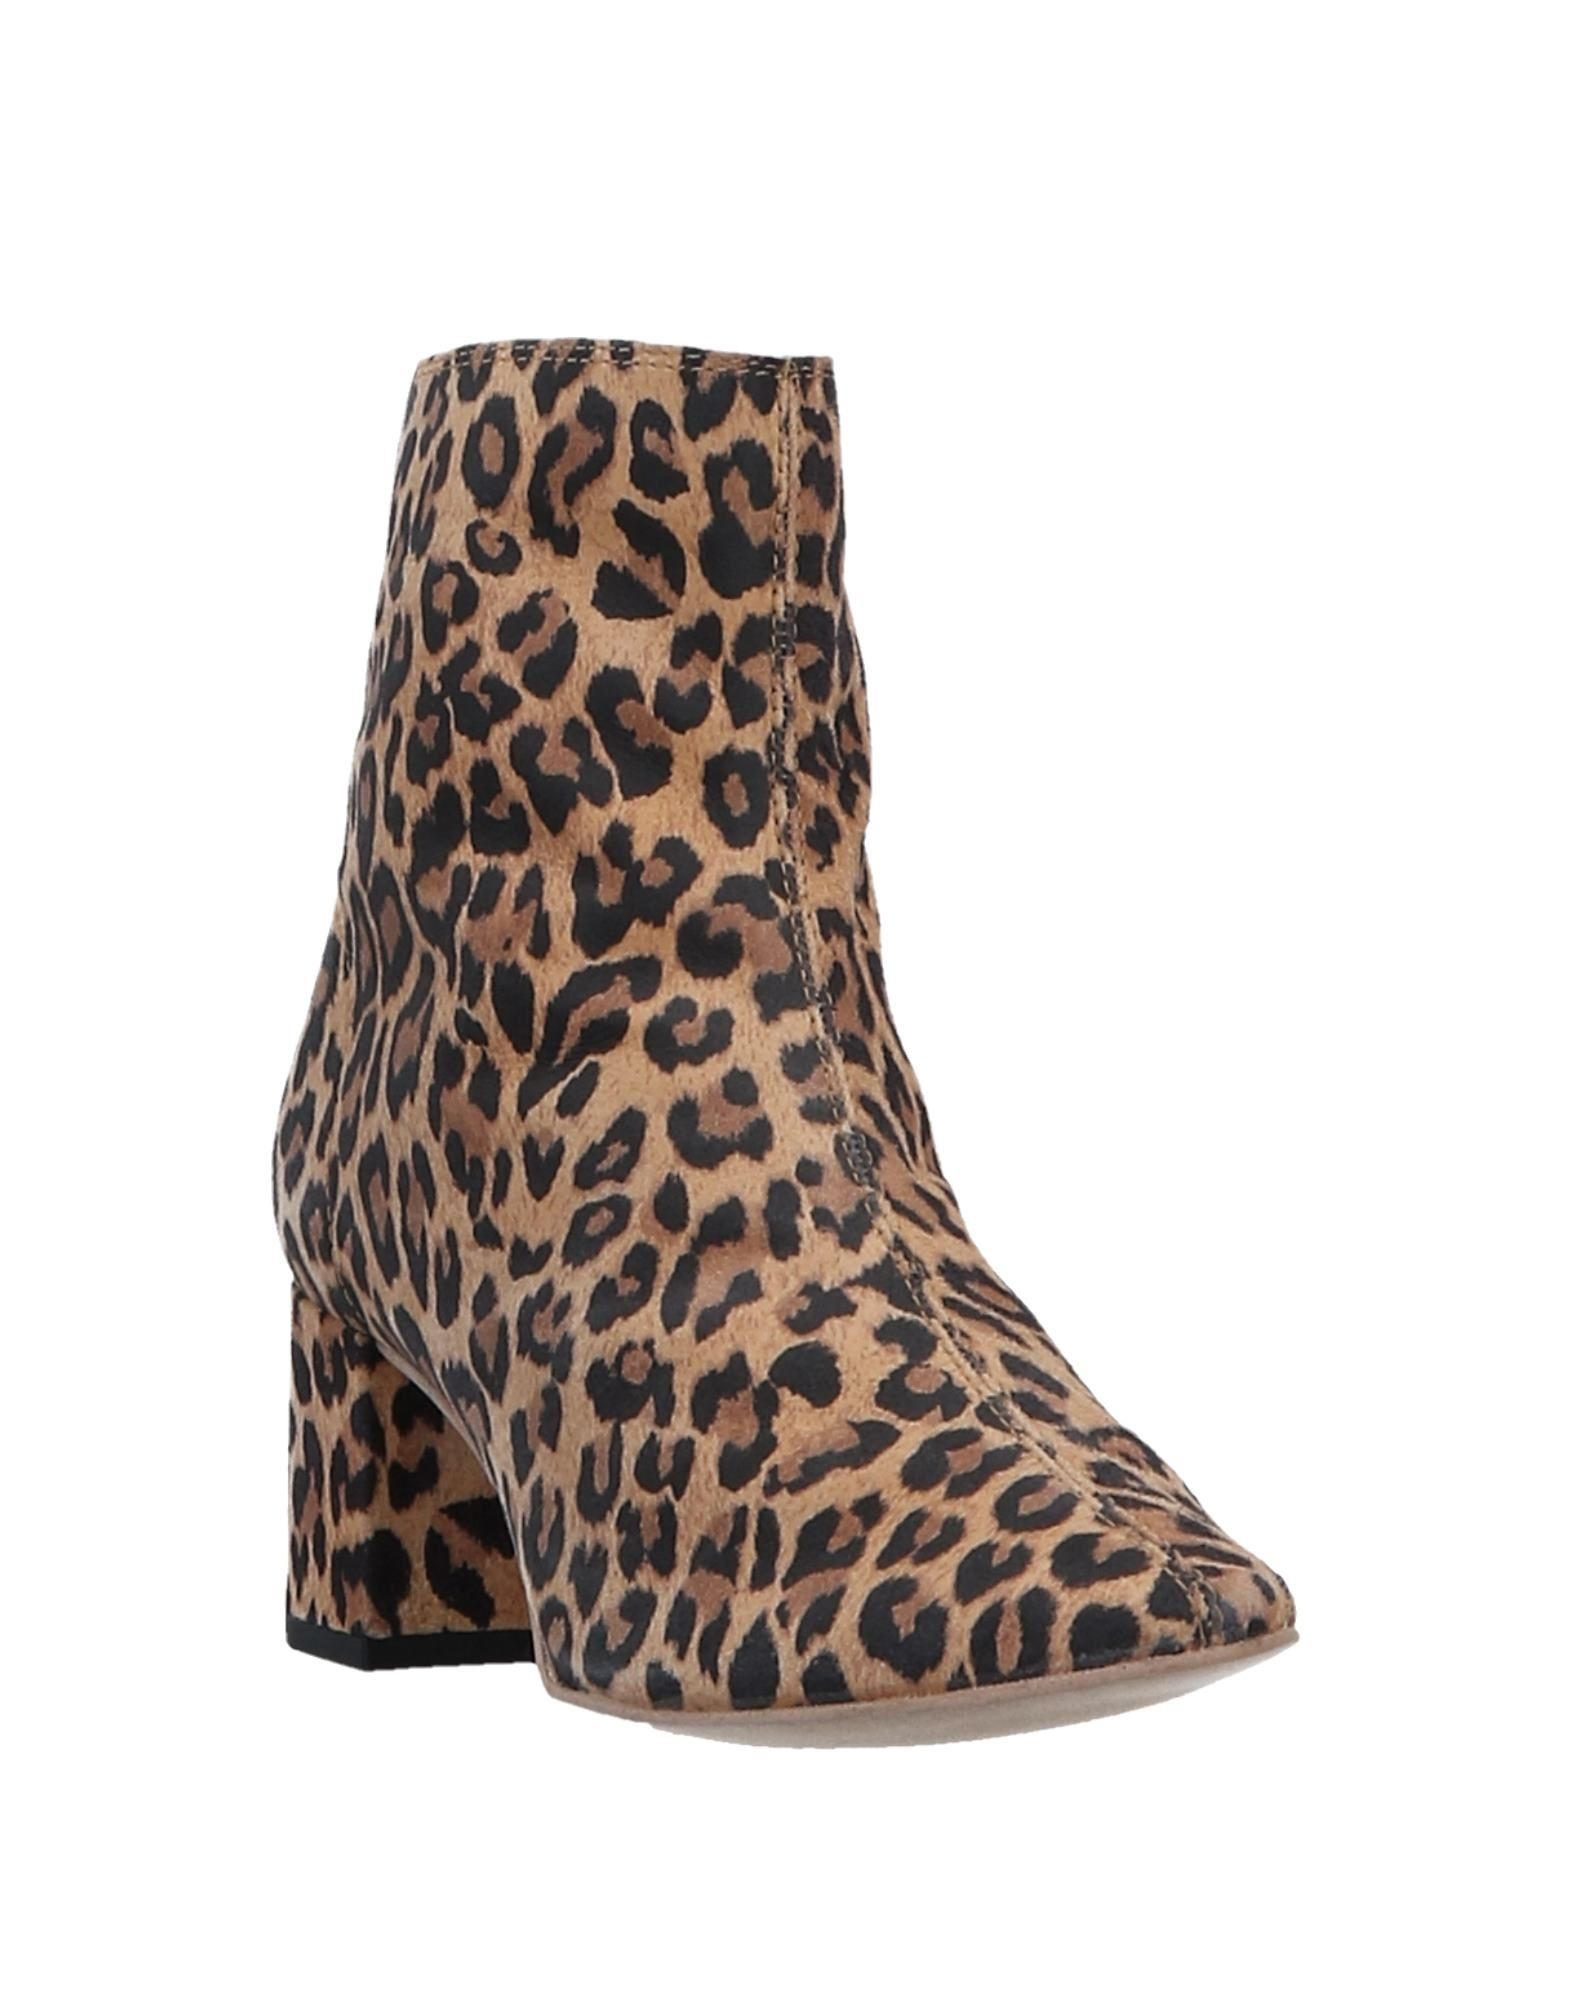 Lollipops Stiefelette Damen  Schuhe 11515752OU Gute Qualität beliebte Schuhe  1c0765